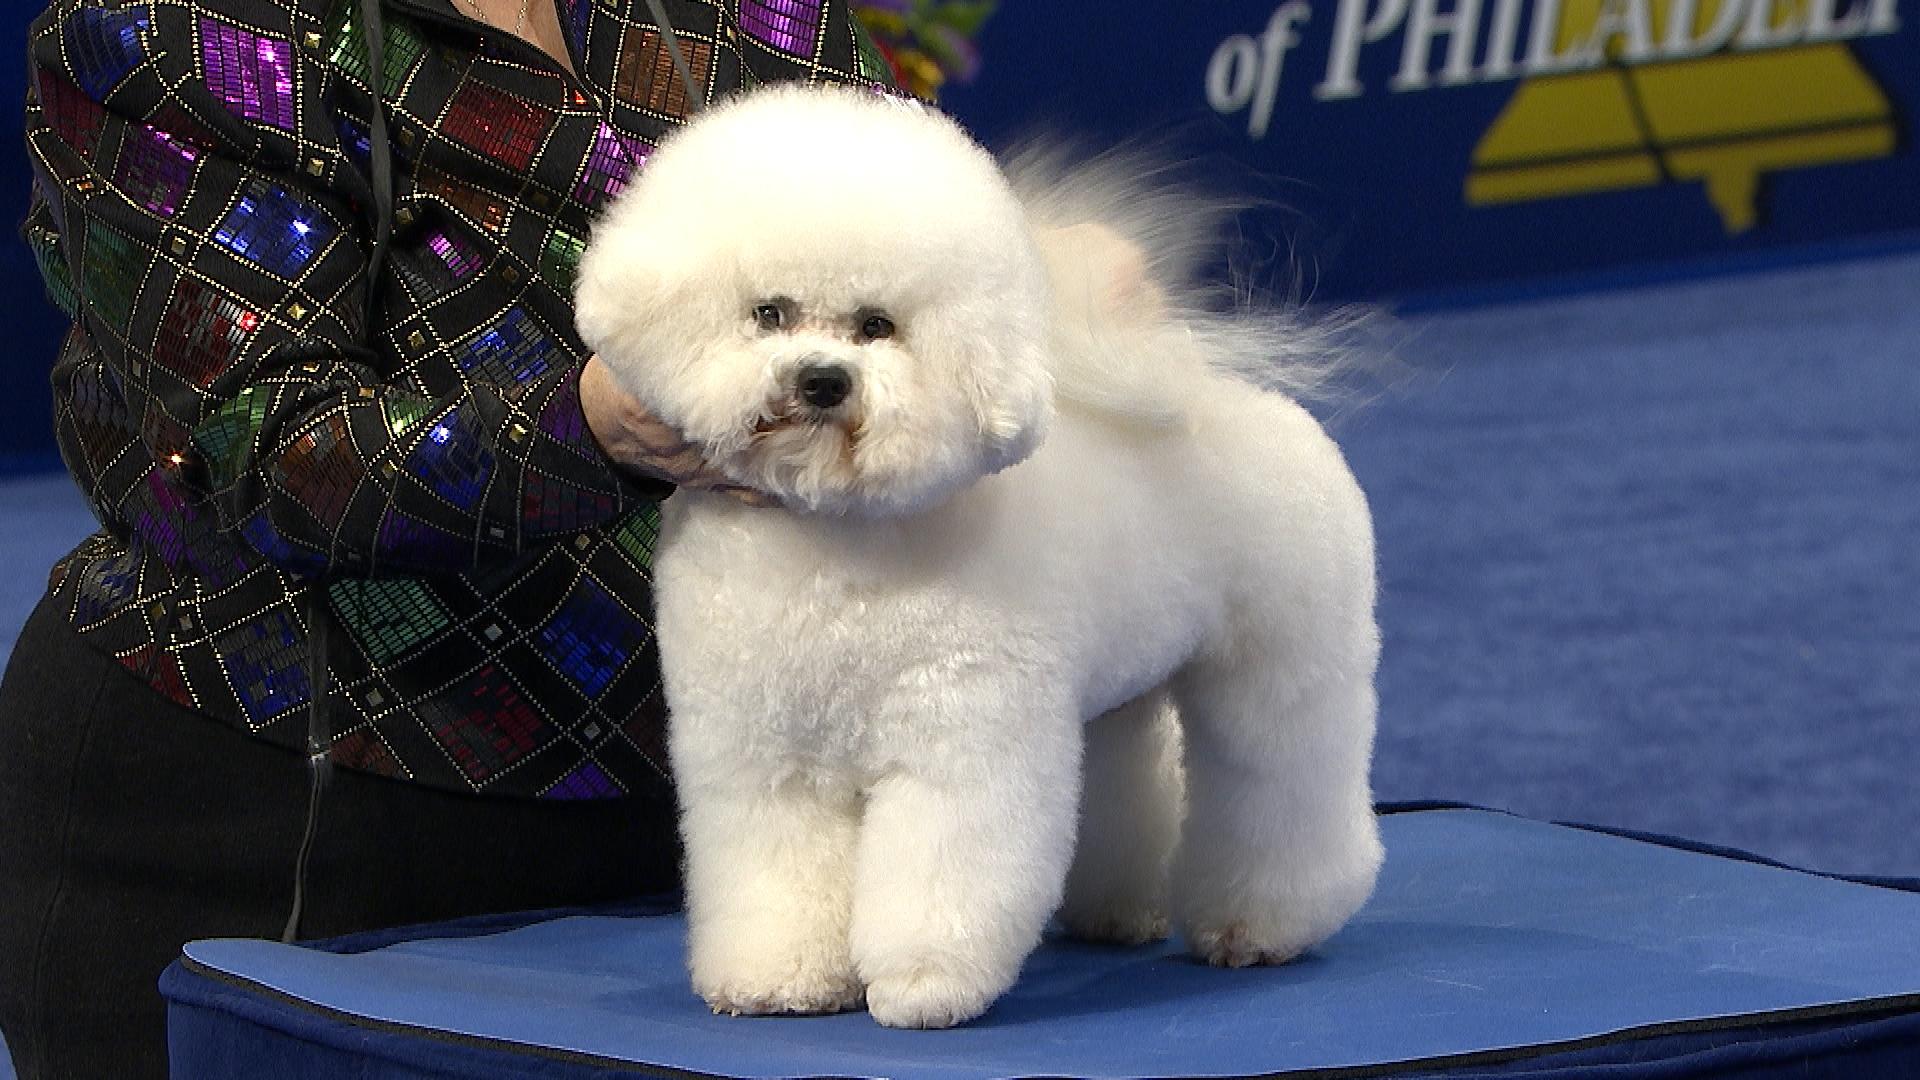 National Dog Show 2019 Bichon Frise 1920x1080 Wallpaper Teahub Io